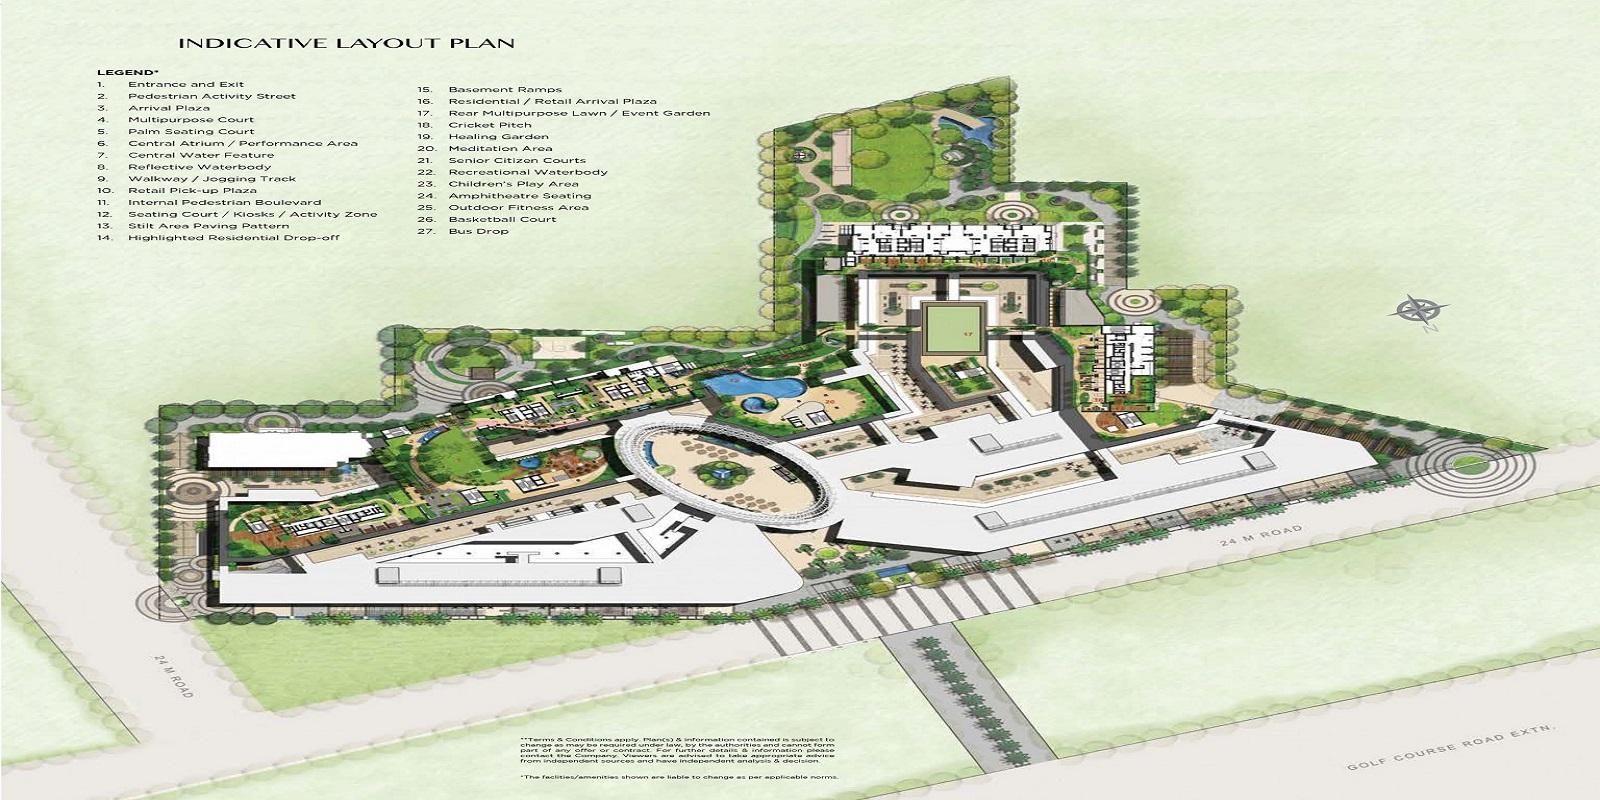 m3m 65 avenue master plan image6